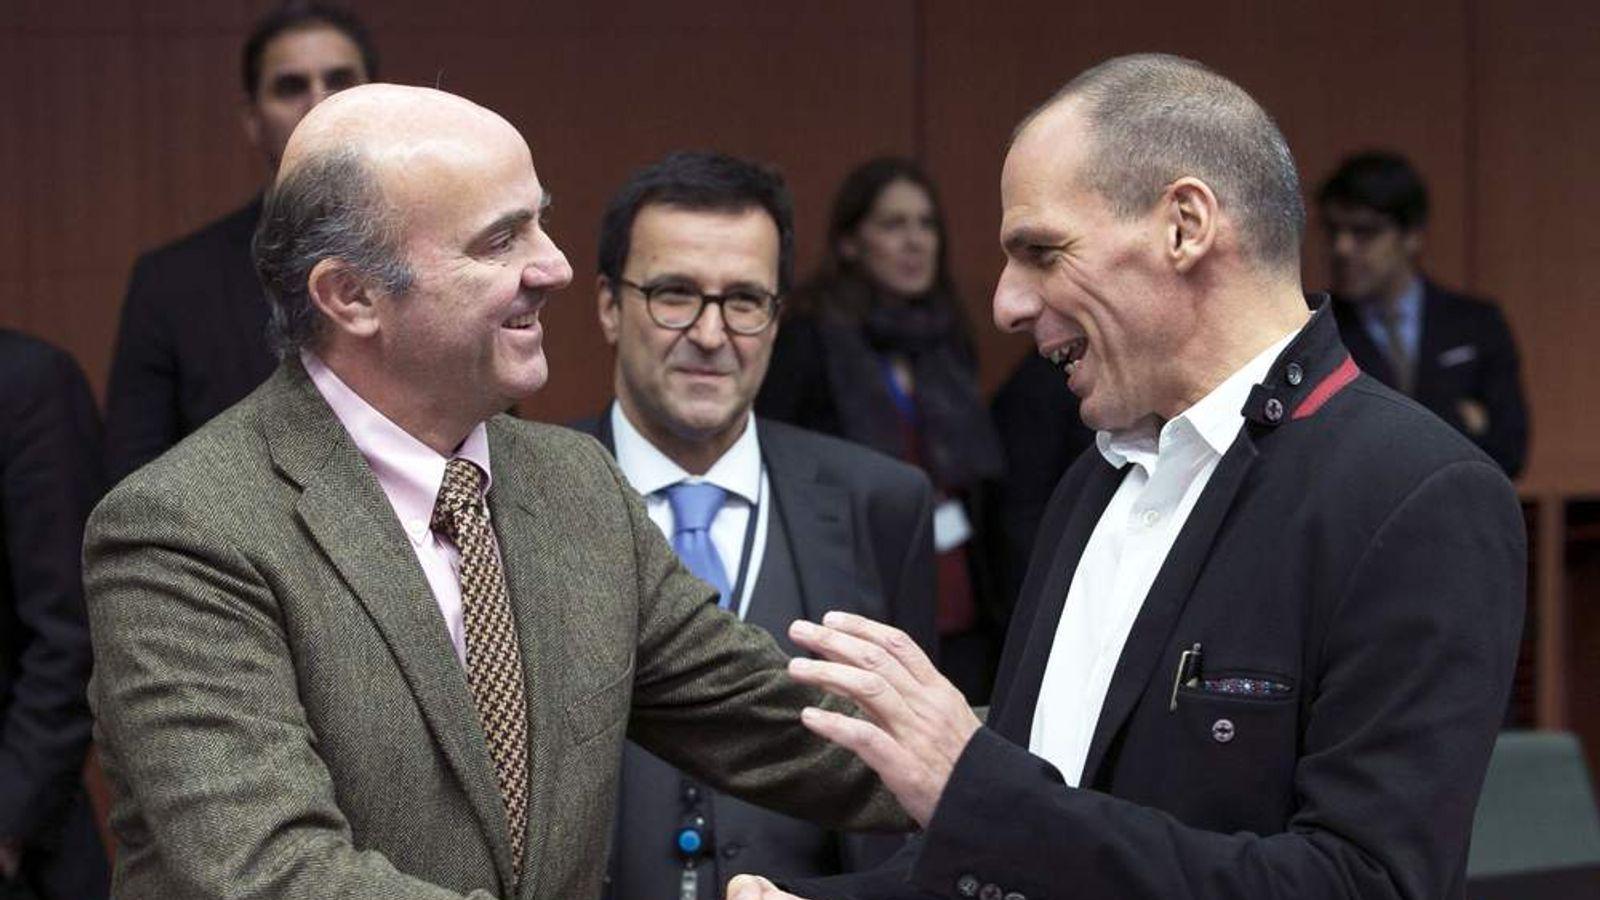 Luis de Guindos (L) talks with Yanis Varoufakis